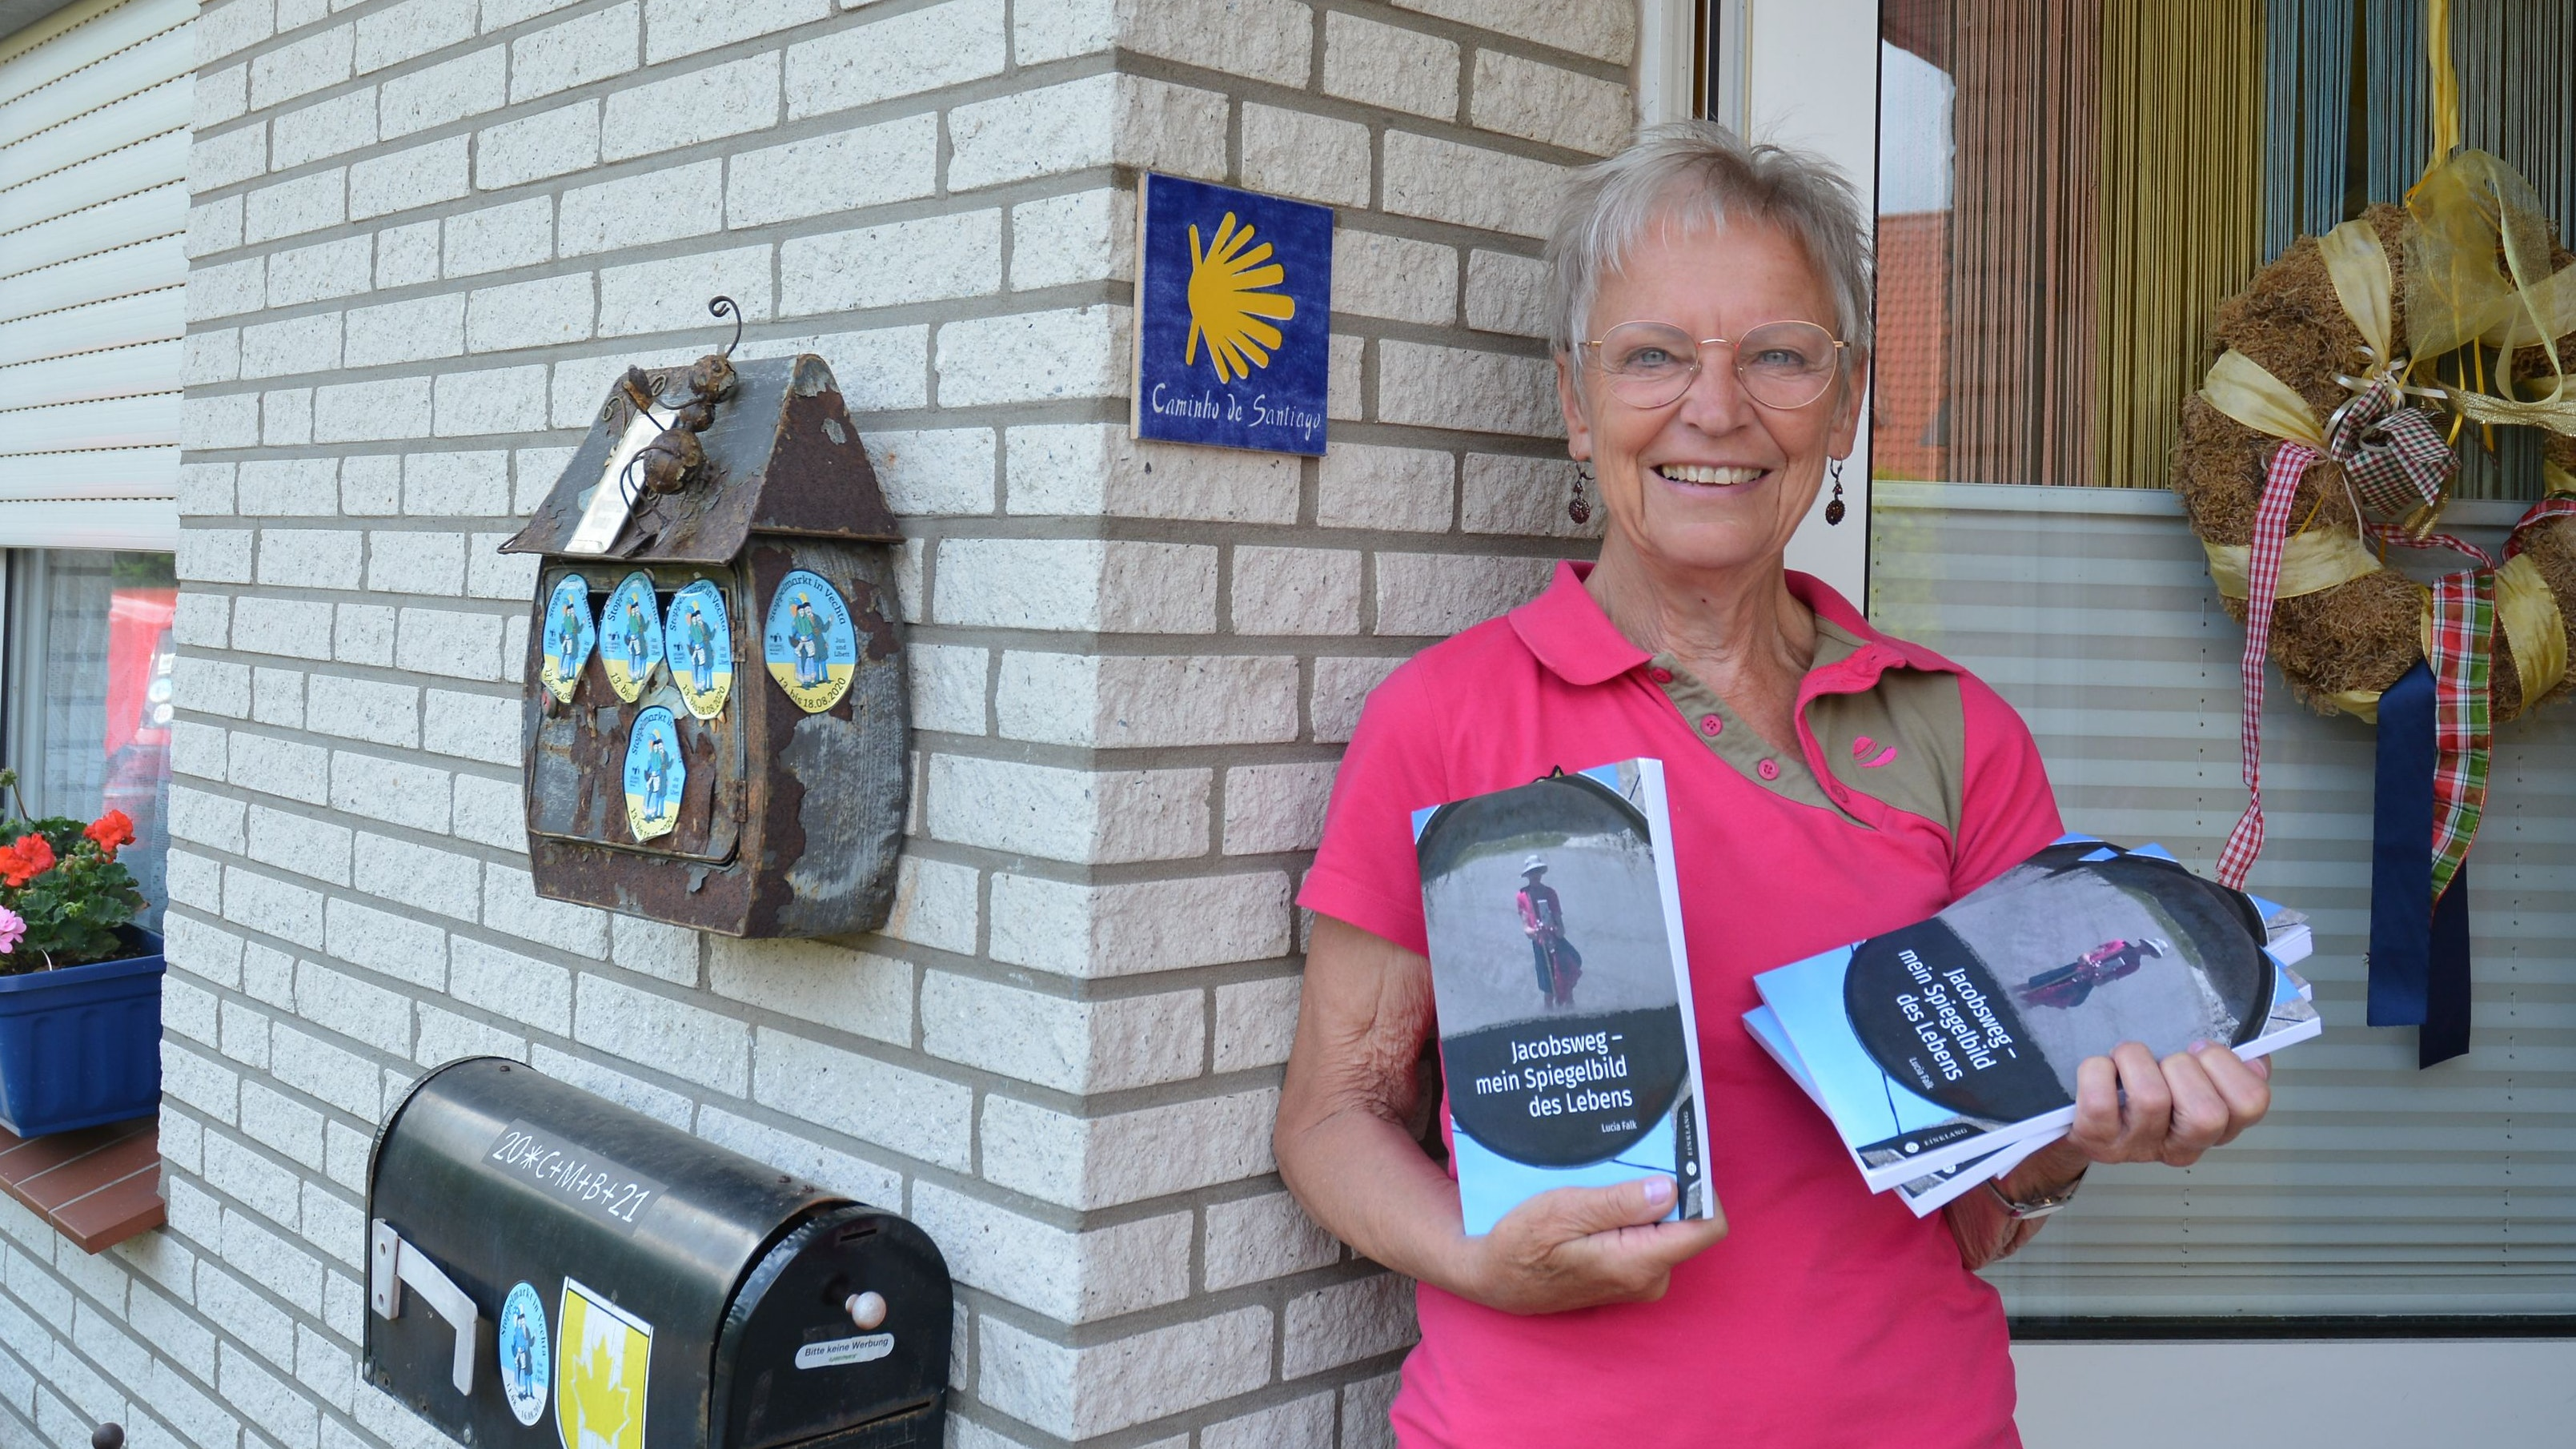 Lucia Falk vor der Jakobsmuschel an ihrer Haustür. Foto: E.Wenzel